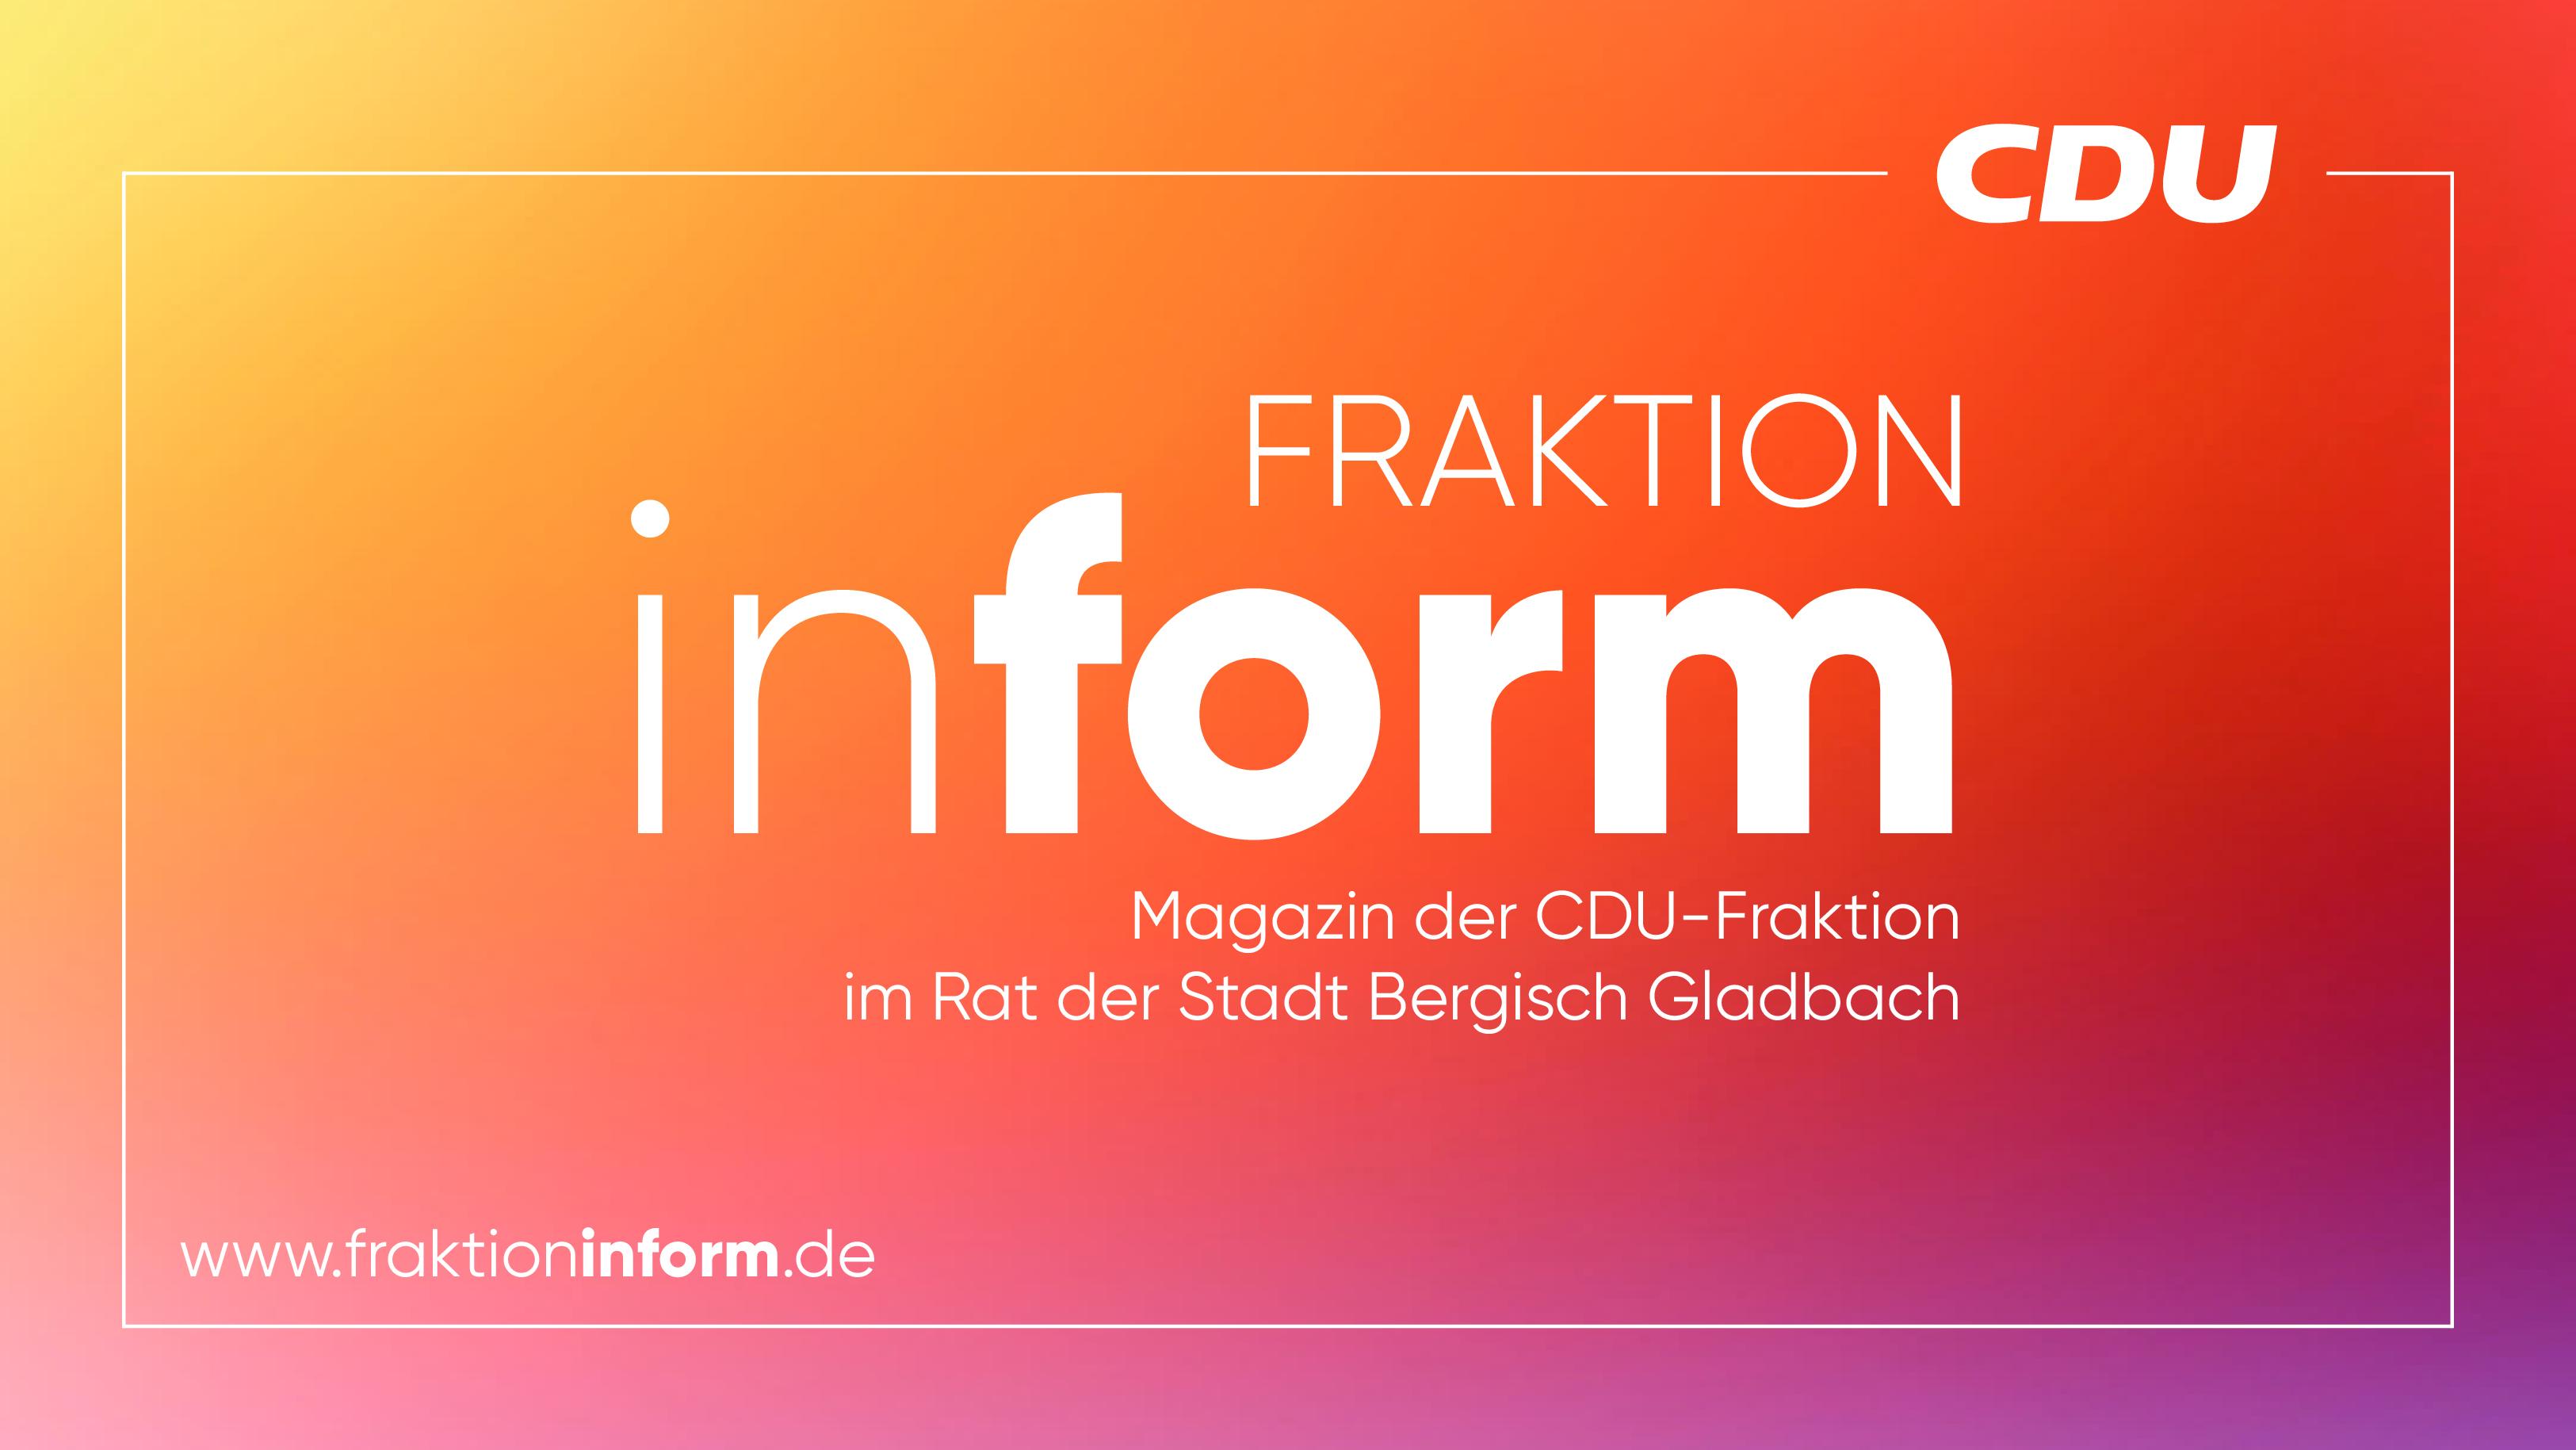 www.fraktioninform.de